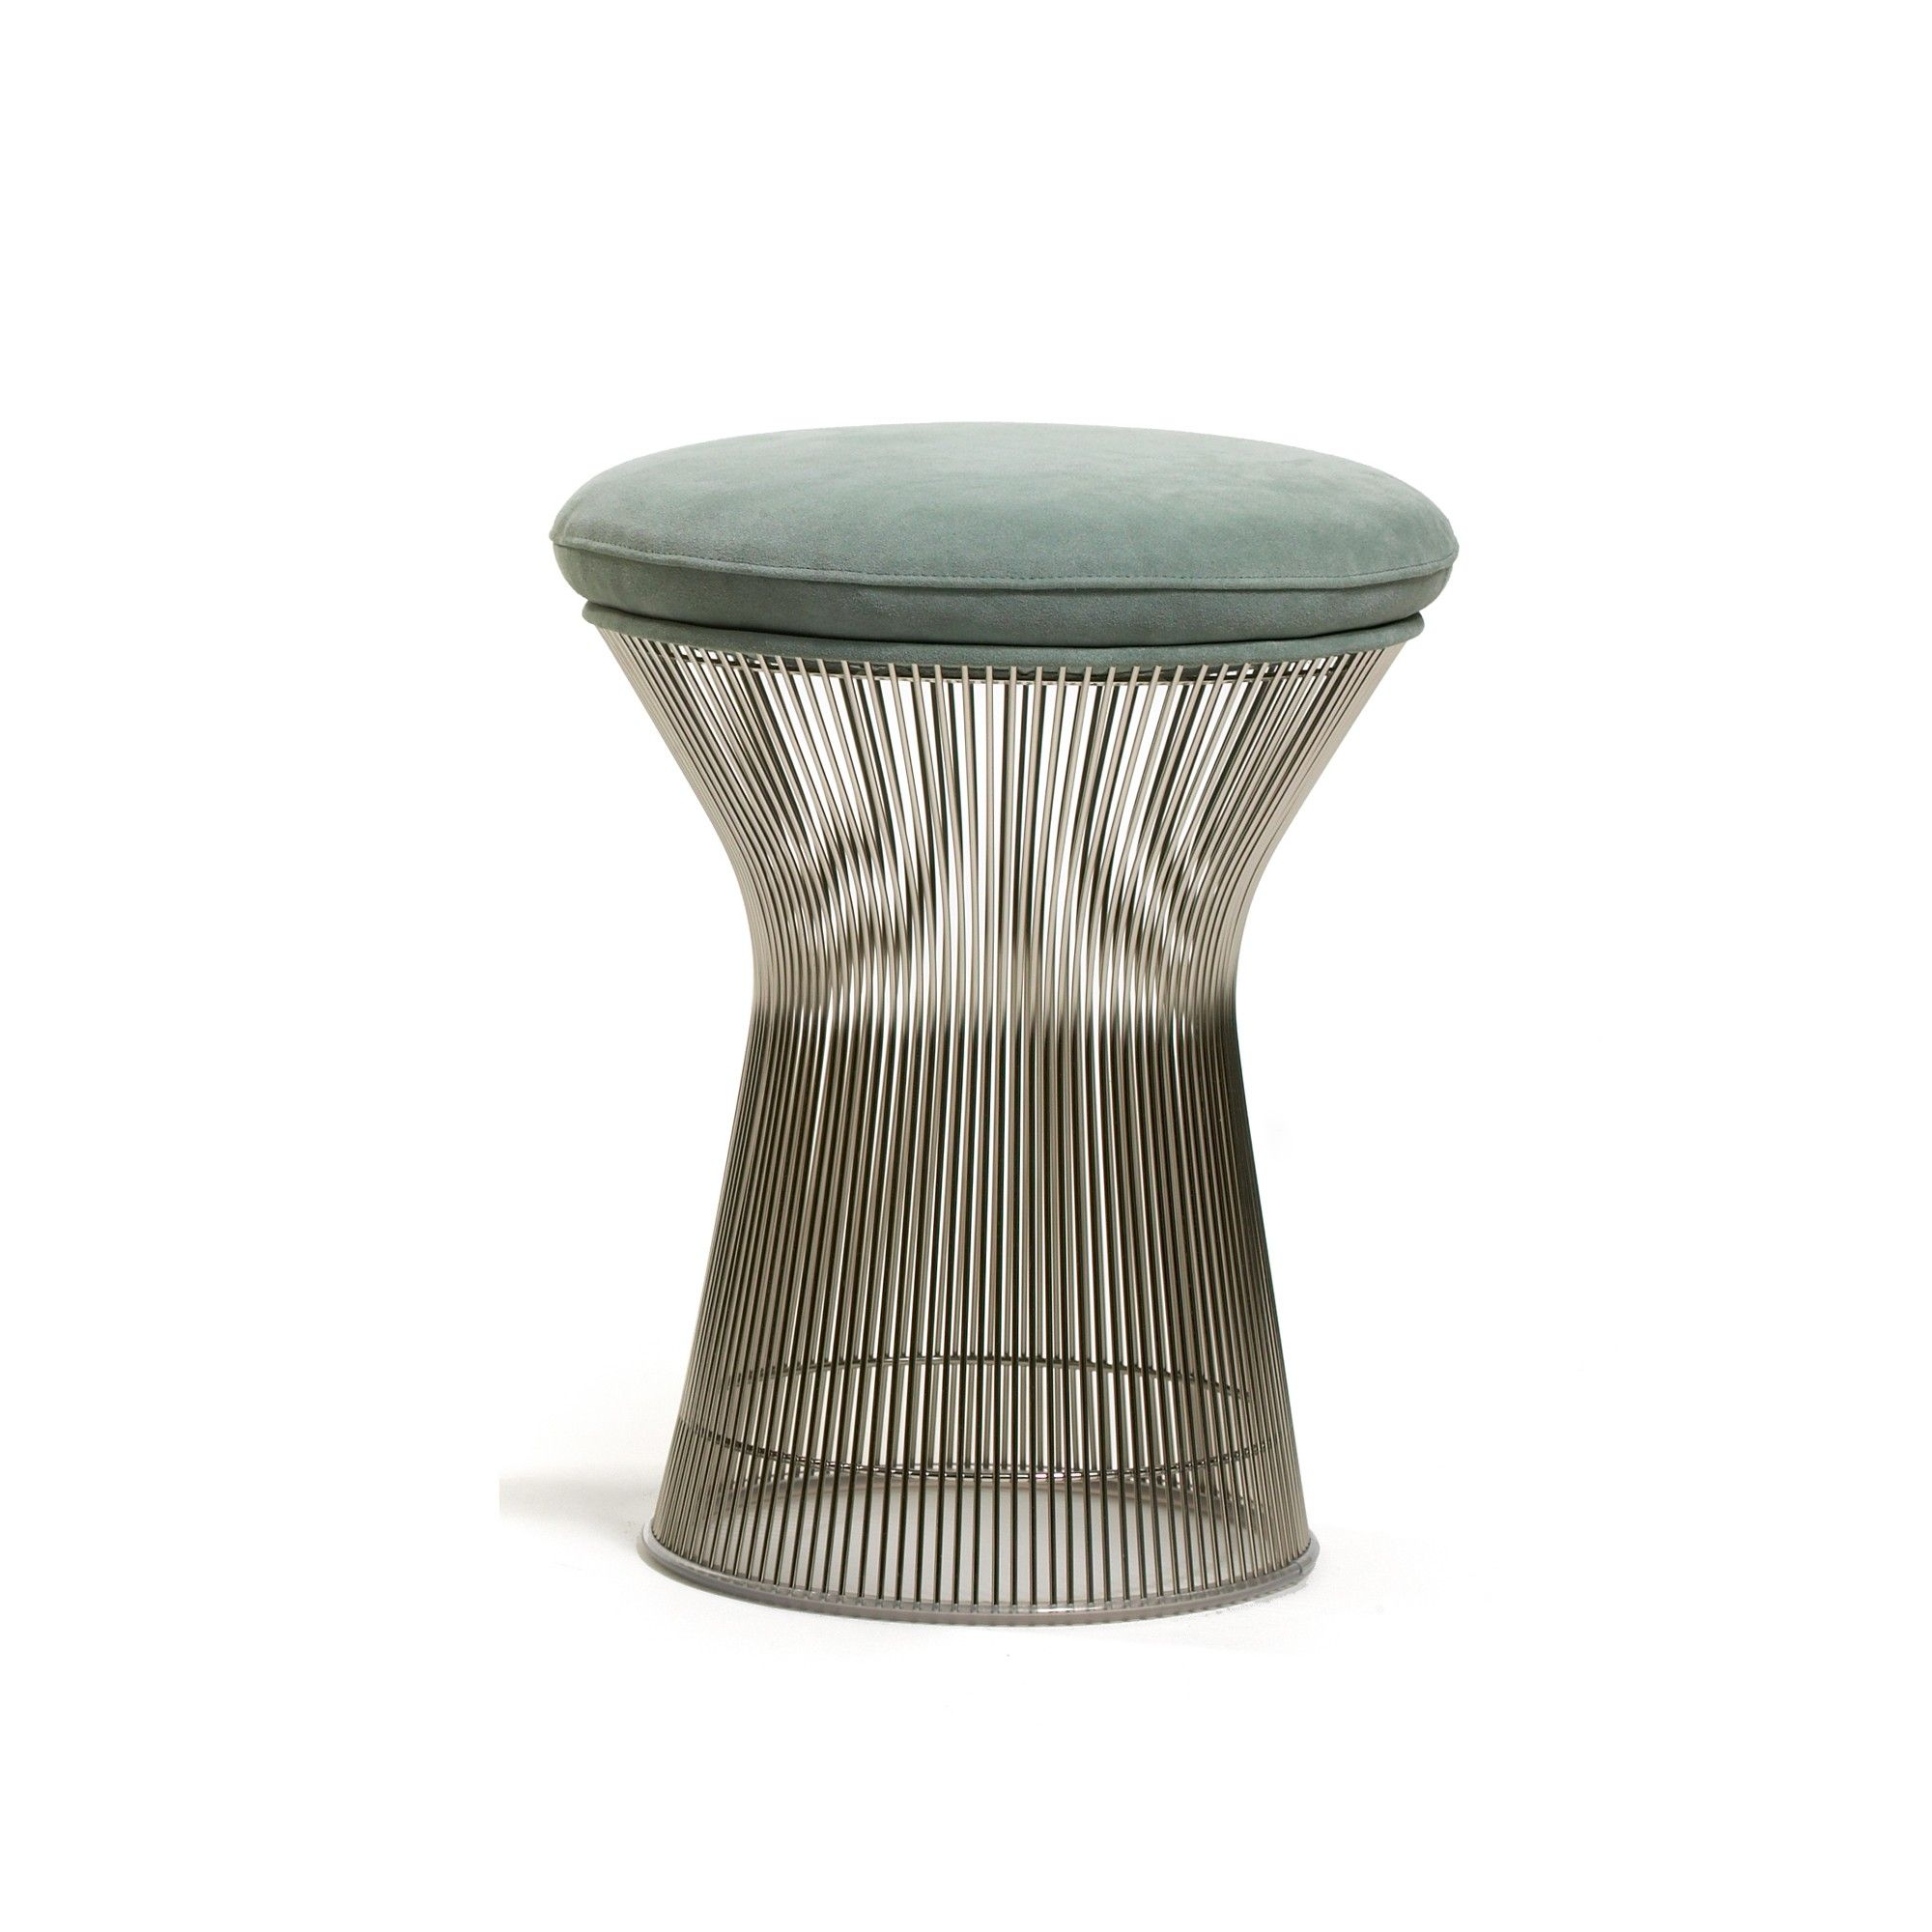 Knoll Felt Upholstery in Canary on Warren Platner Side Chair